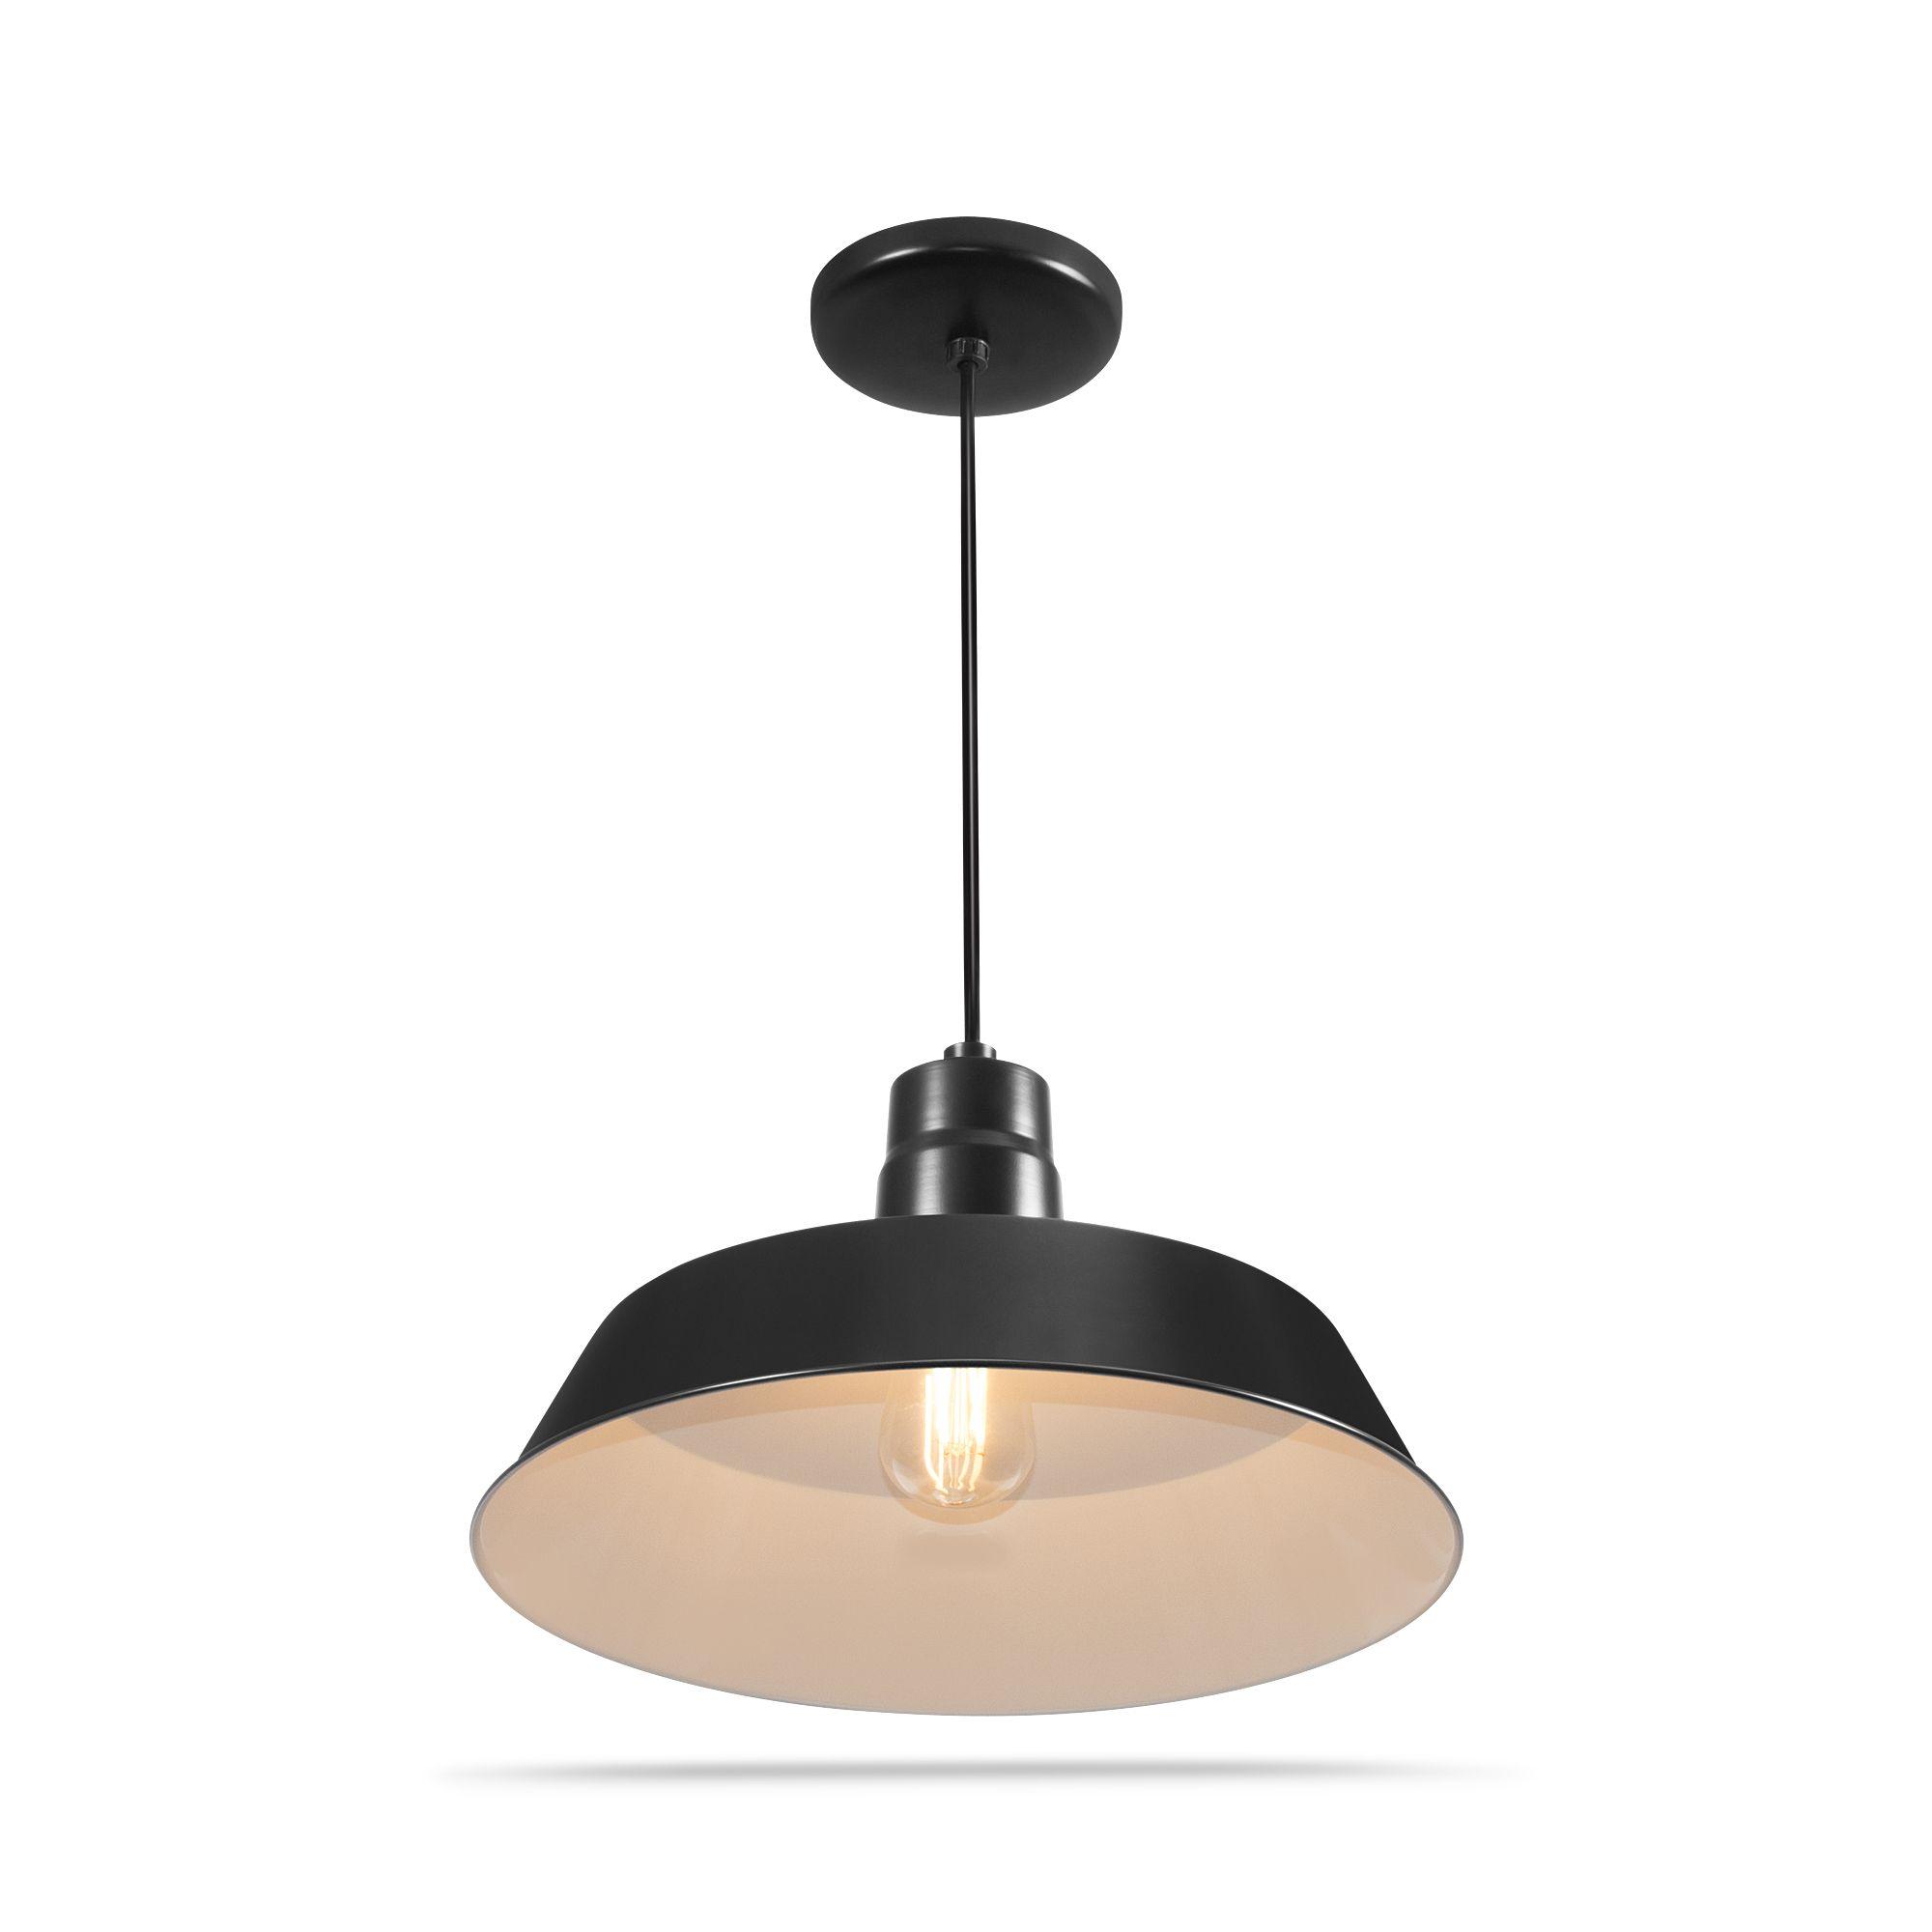 Htmlighting Newproduct Cordhung Vintagelight Pendantbarnlight Interiorbarnlight Barn In 2020 Vintage Pendant Lighting Hanging Light Fixtures Barn Light Fixtures